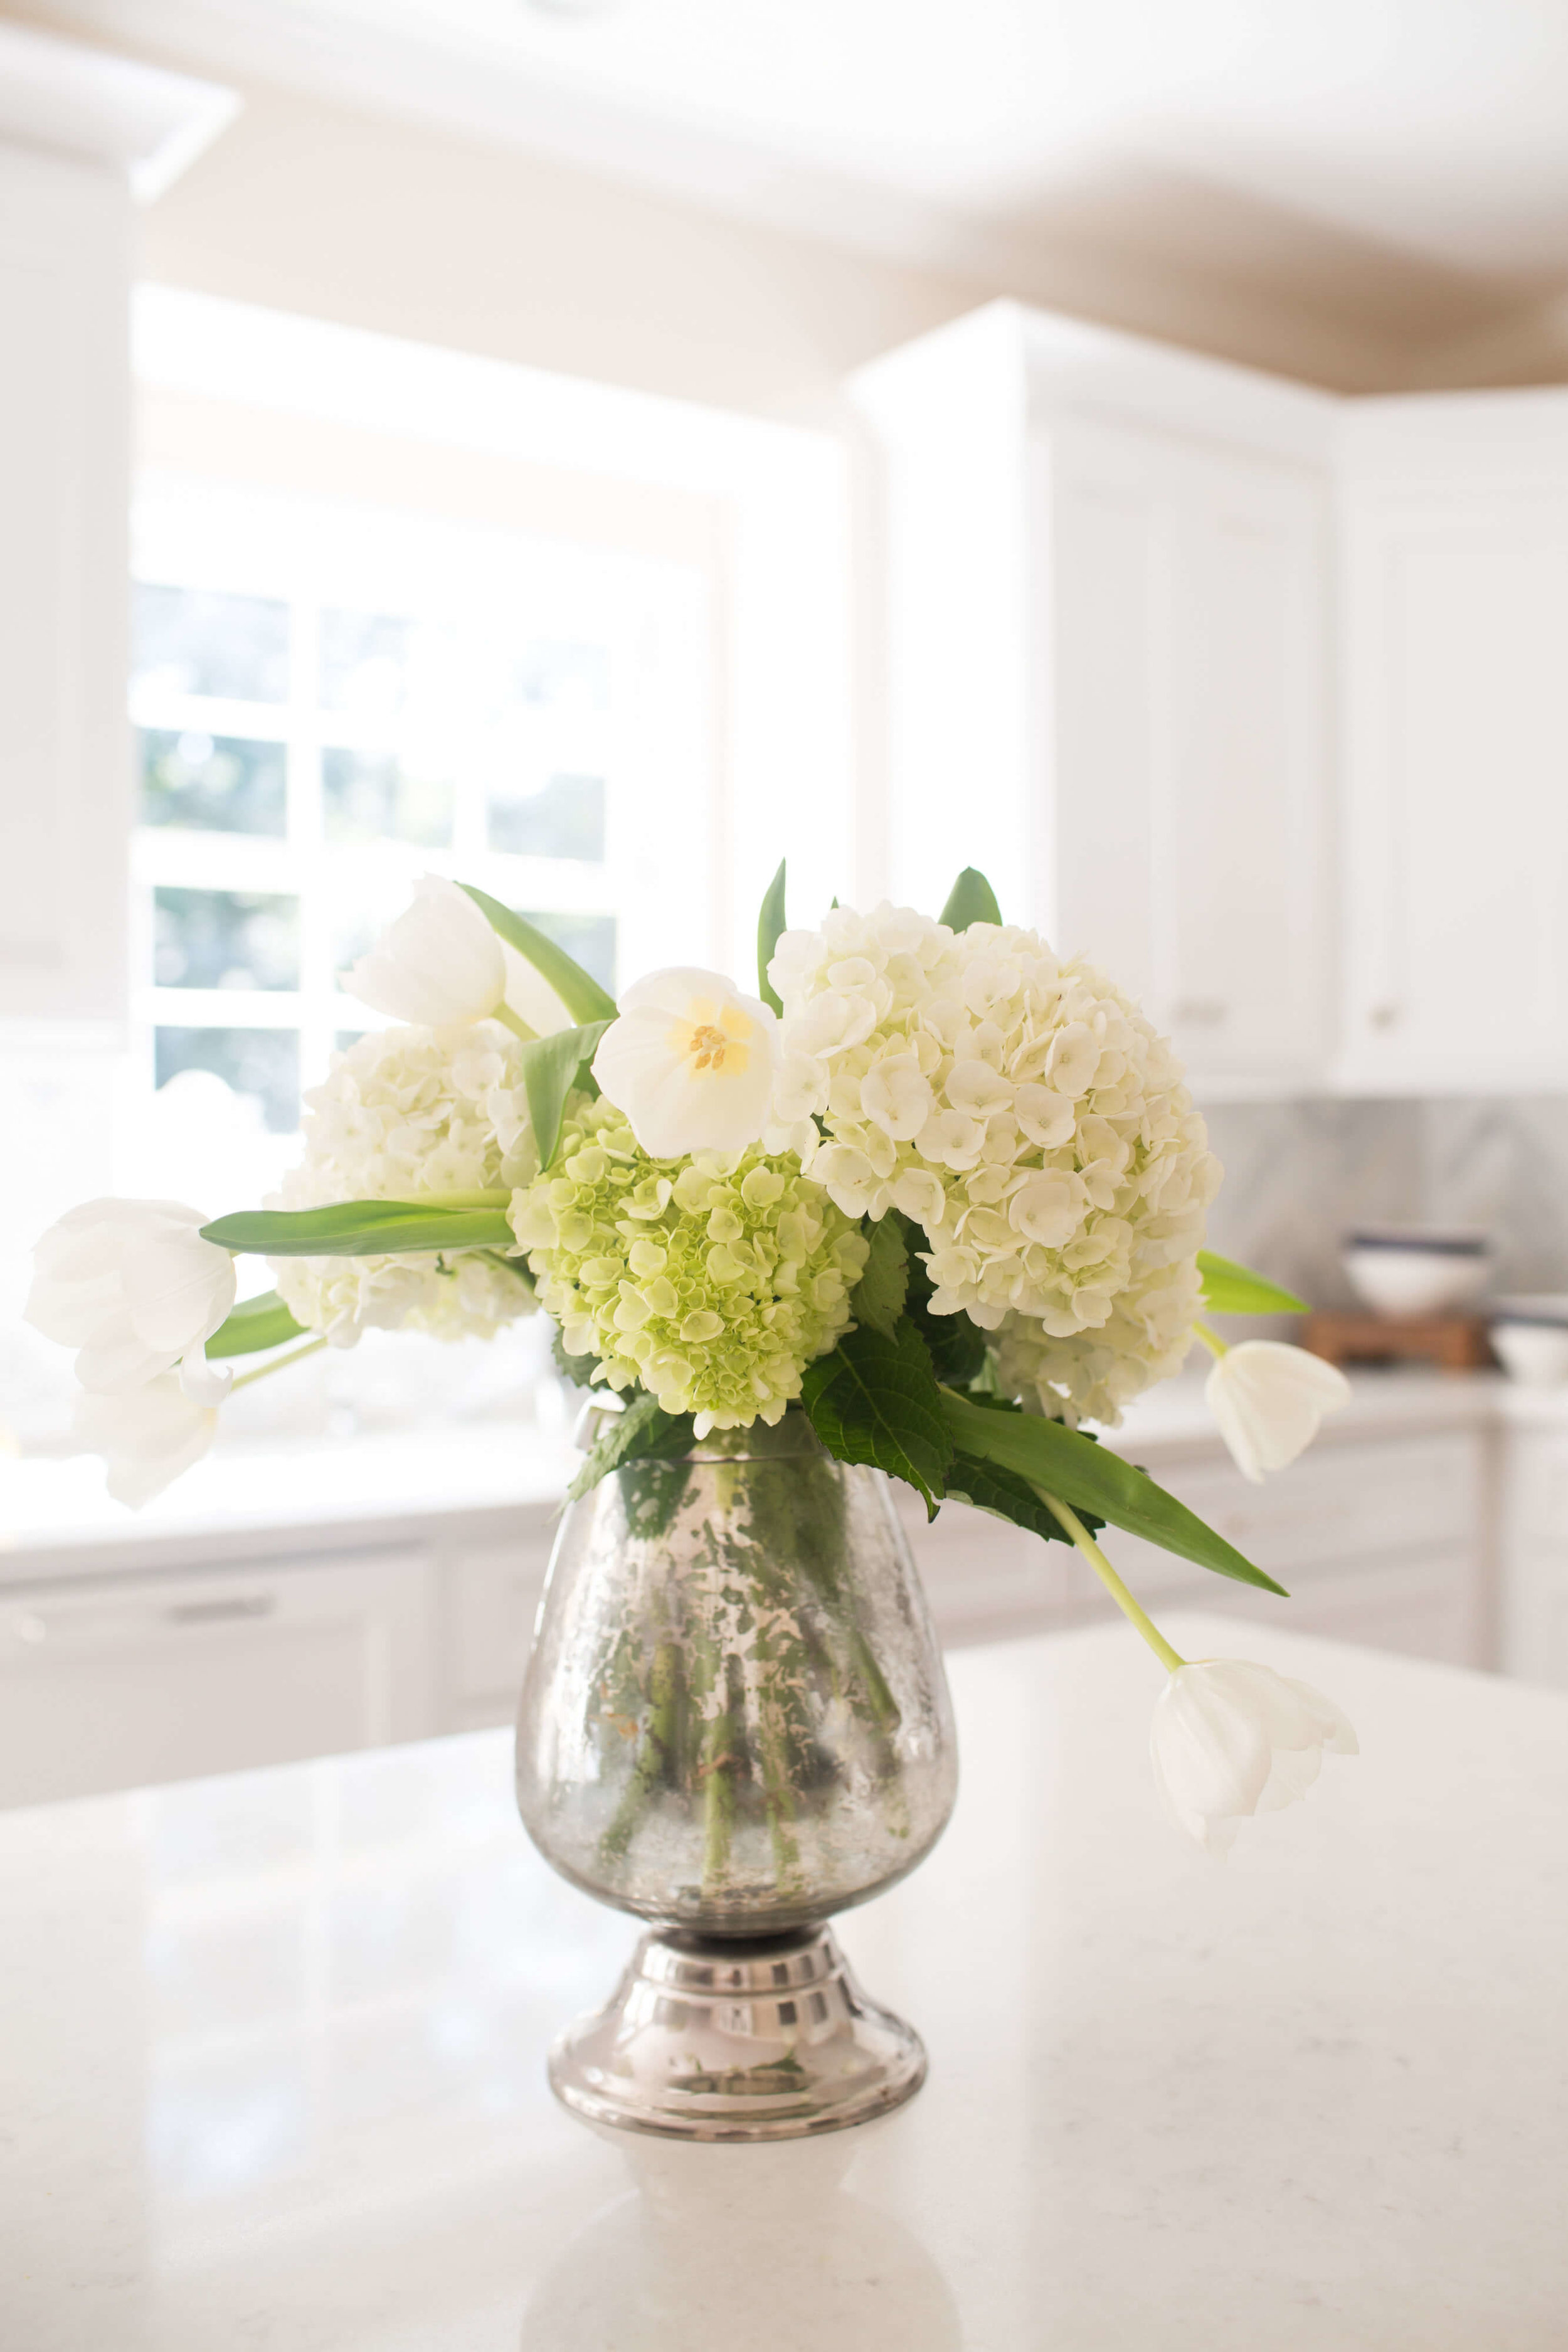 ivory-lane-interiors-sarah-mouser-kitchen-interior-design-atlanta-georgia-10.jpg